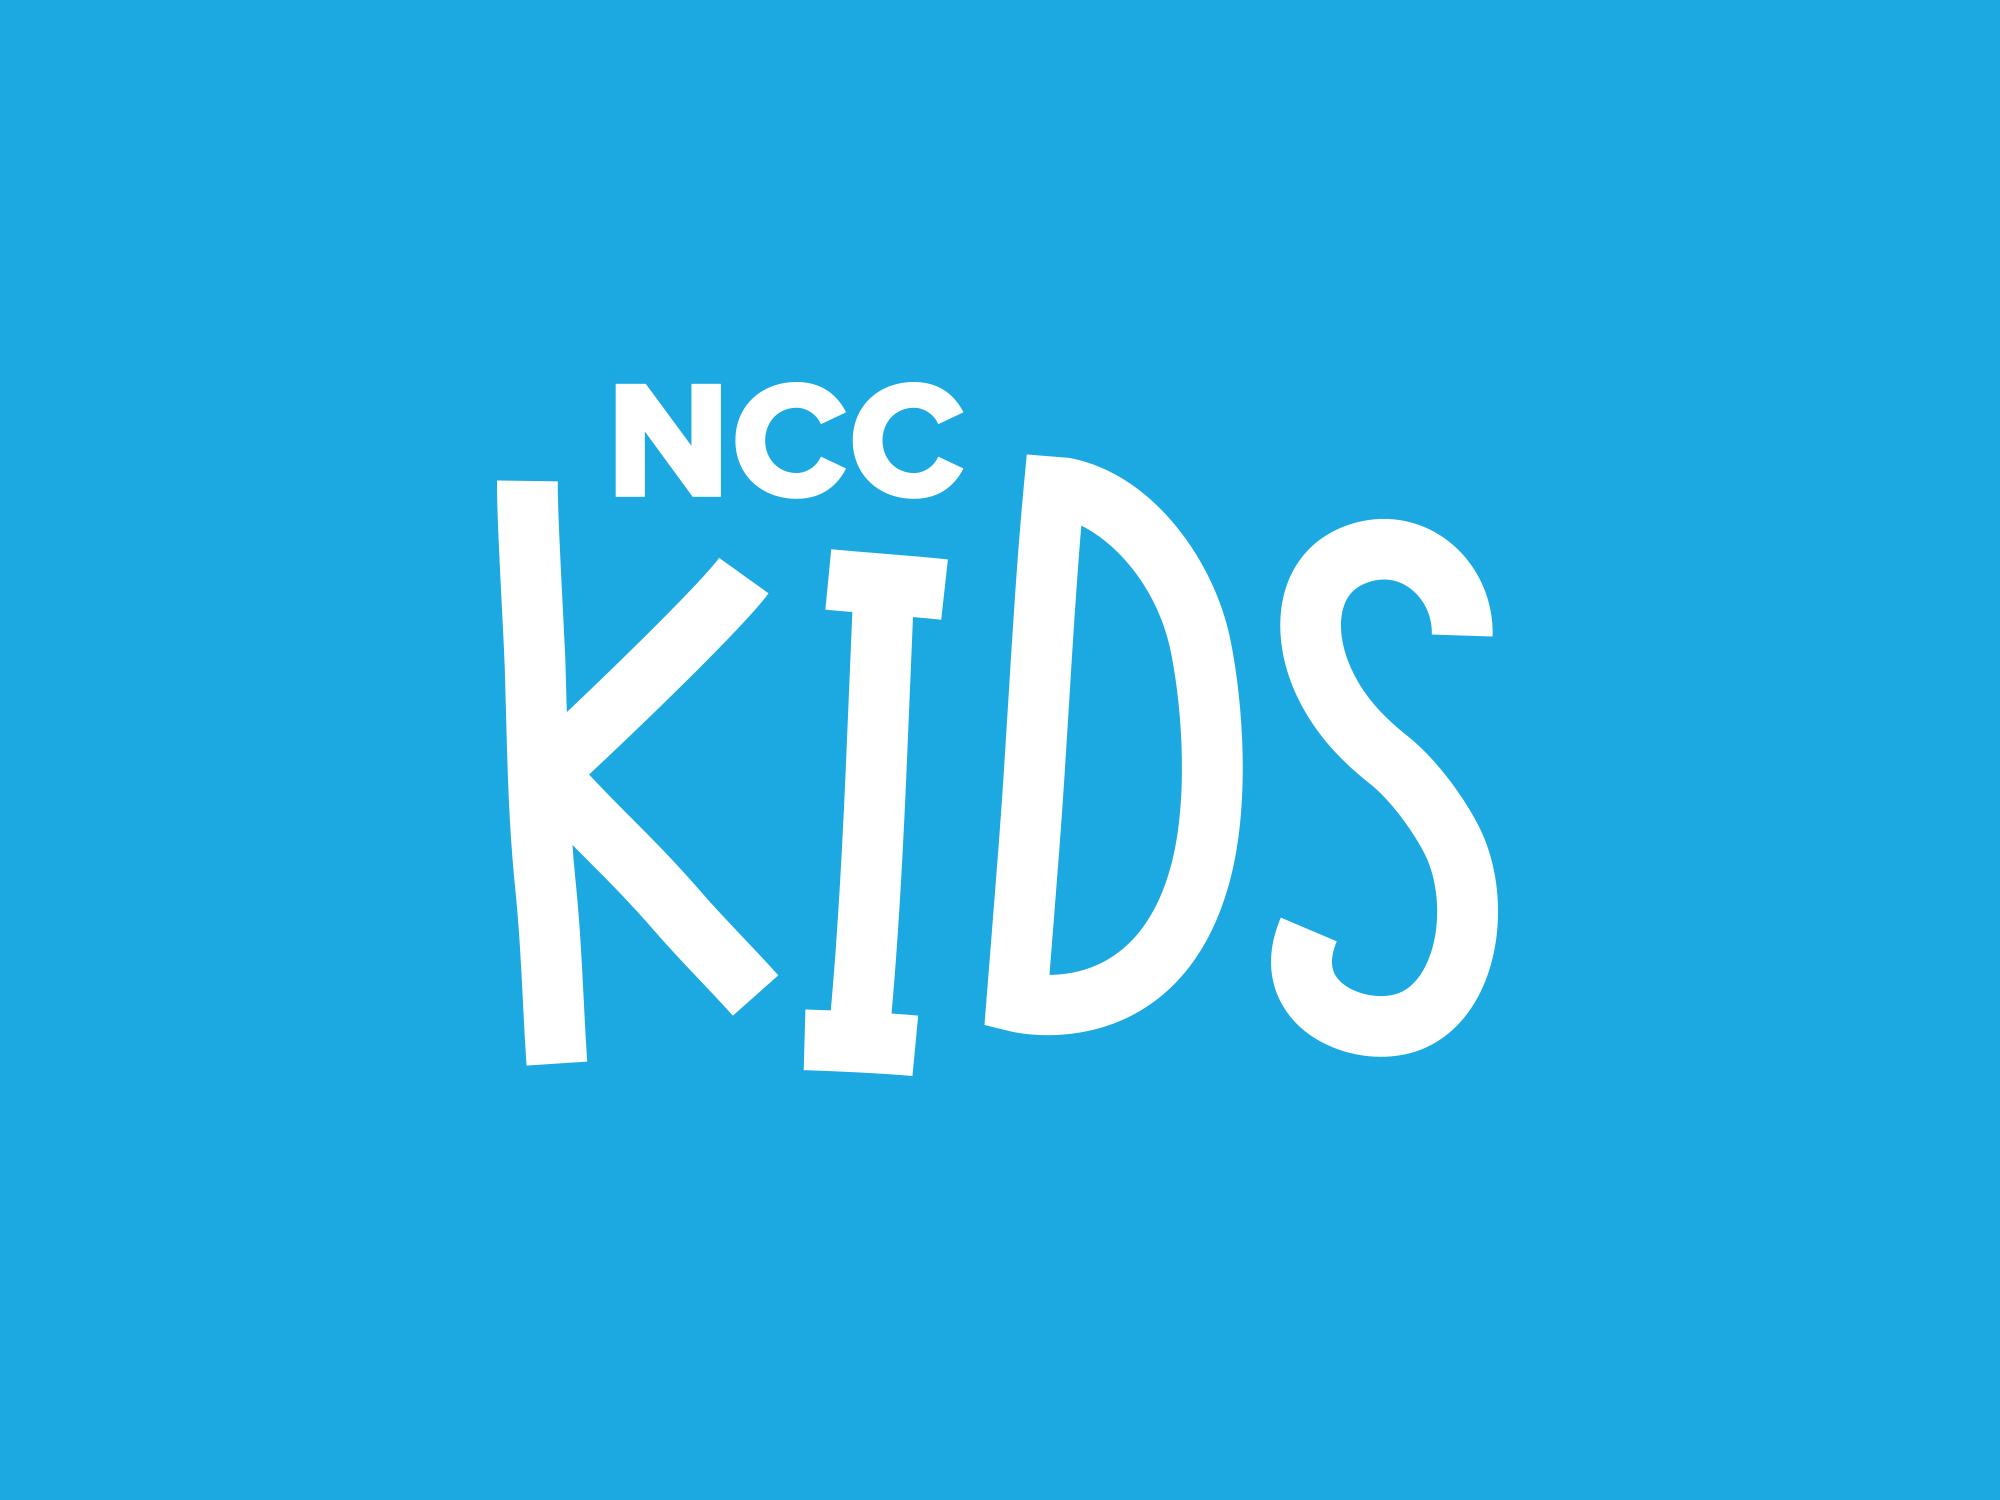 Ncc kids logo 2000px